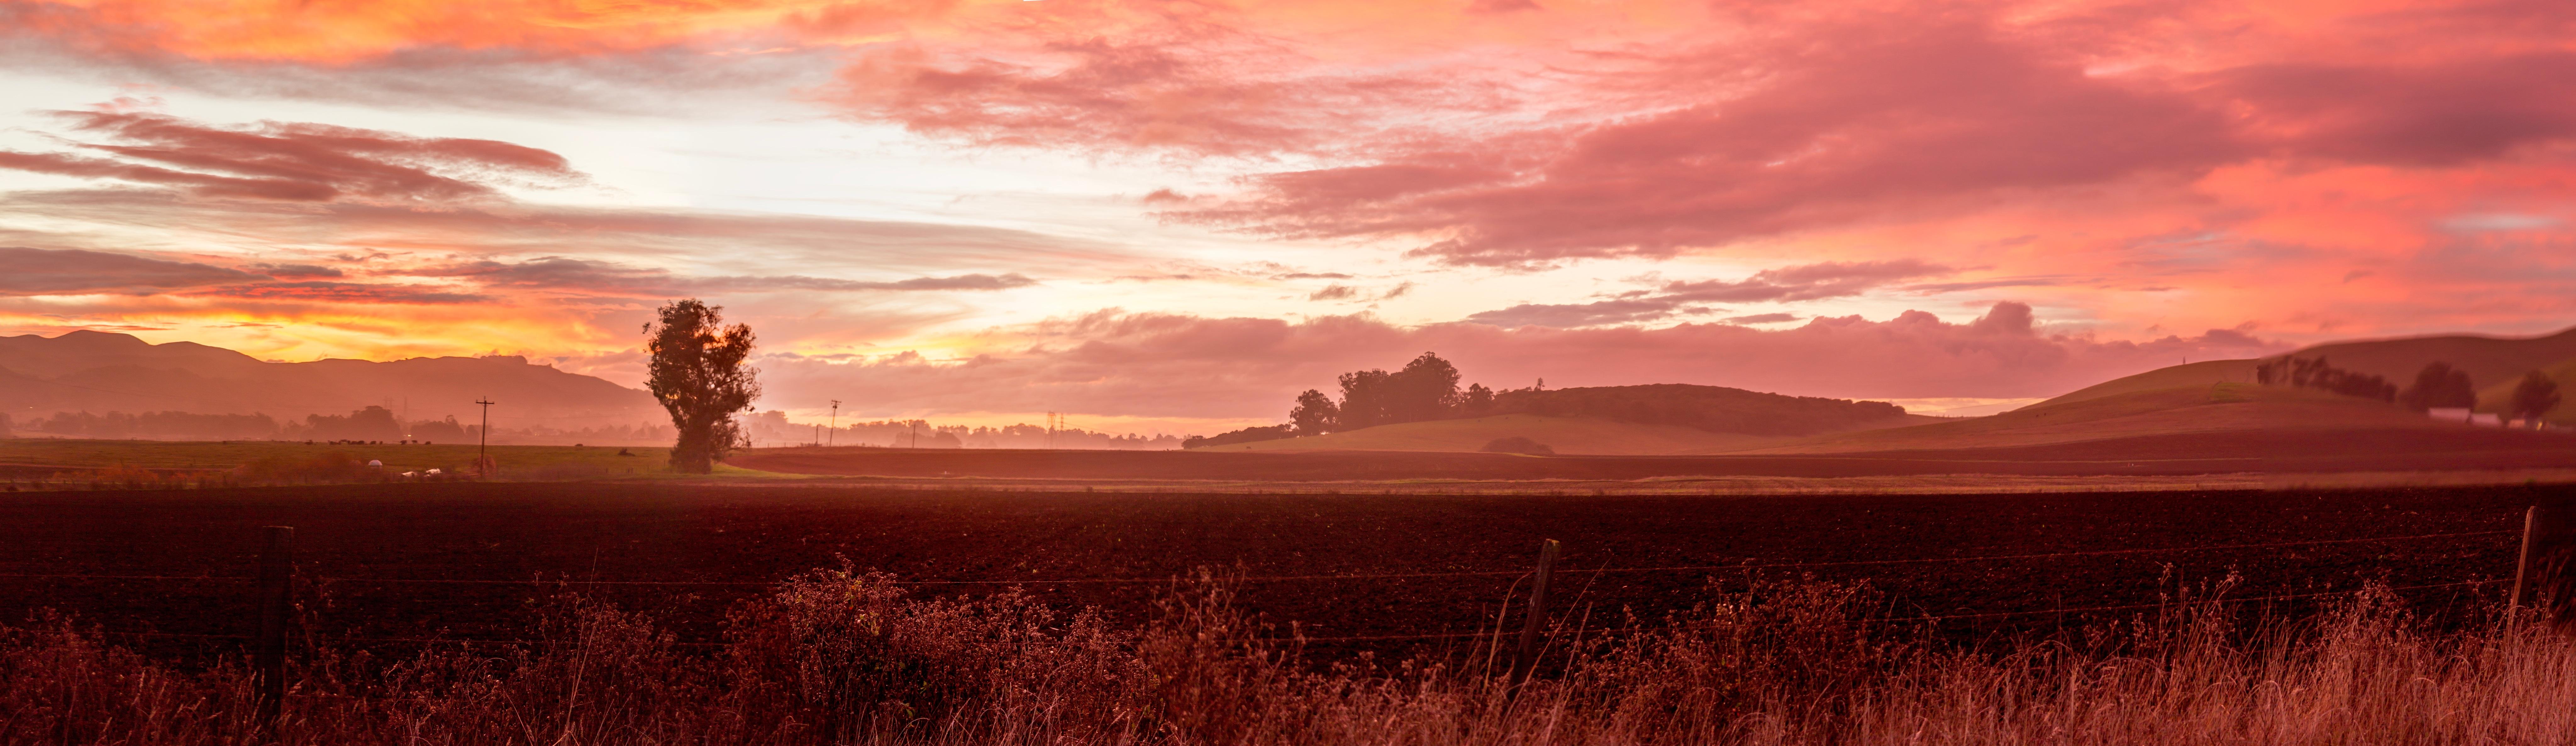 Free Images Landscape Horizon Cloud Sunrise Sunset Prairie